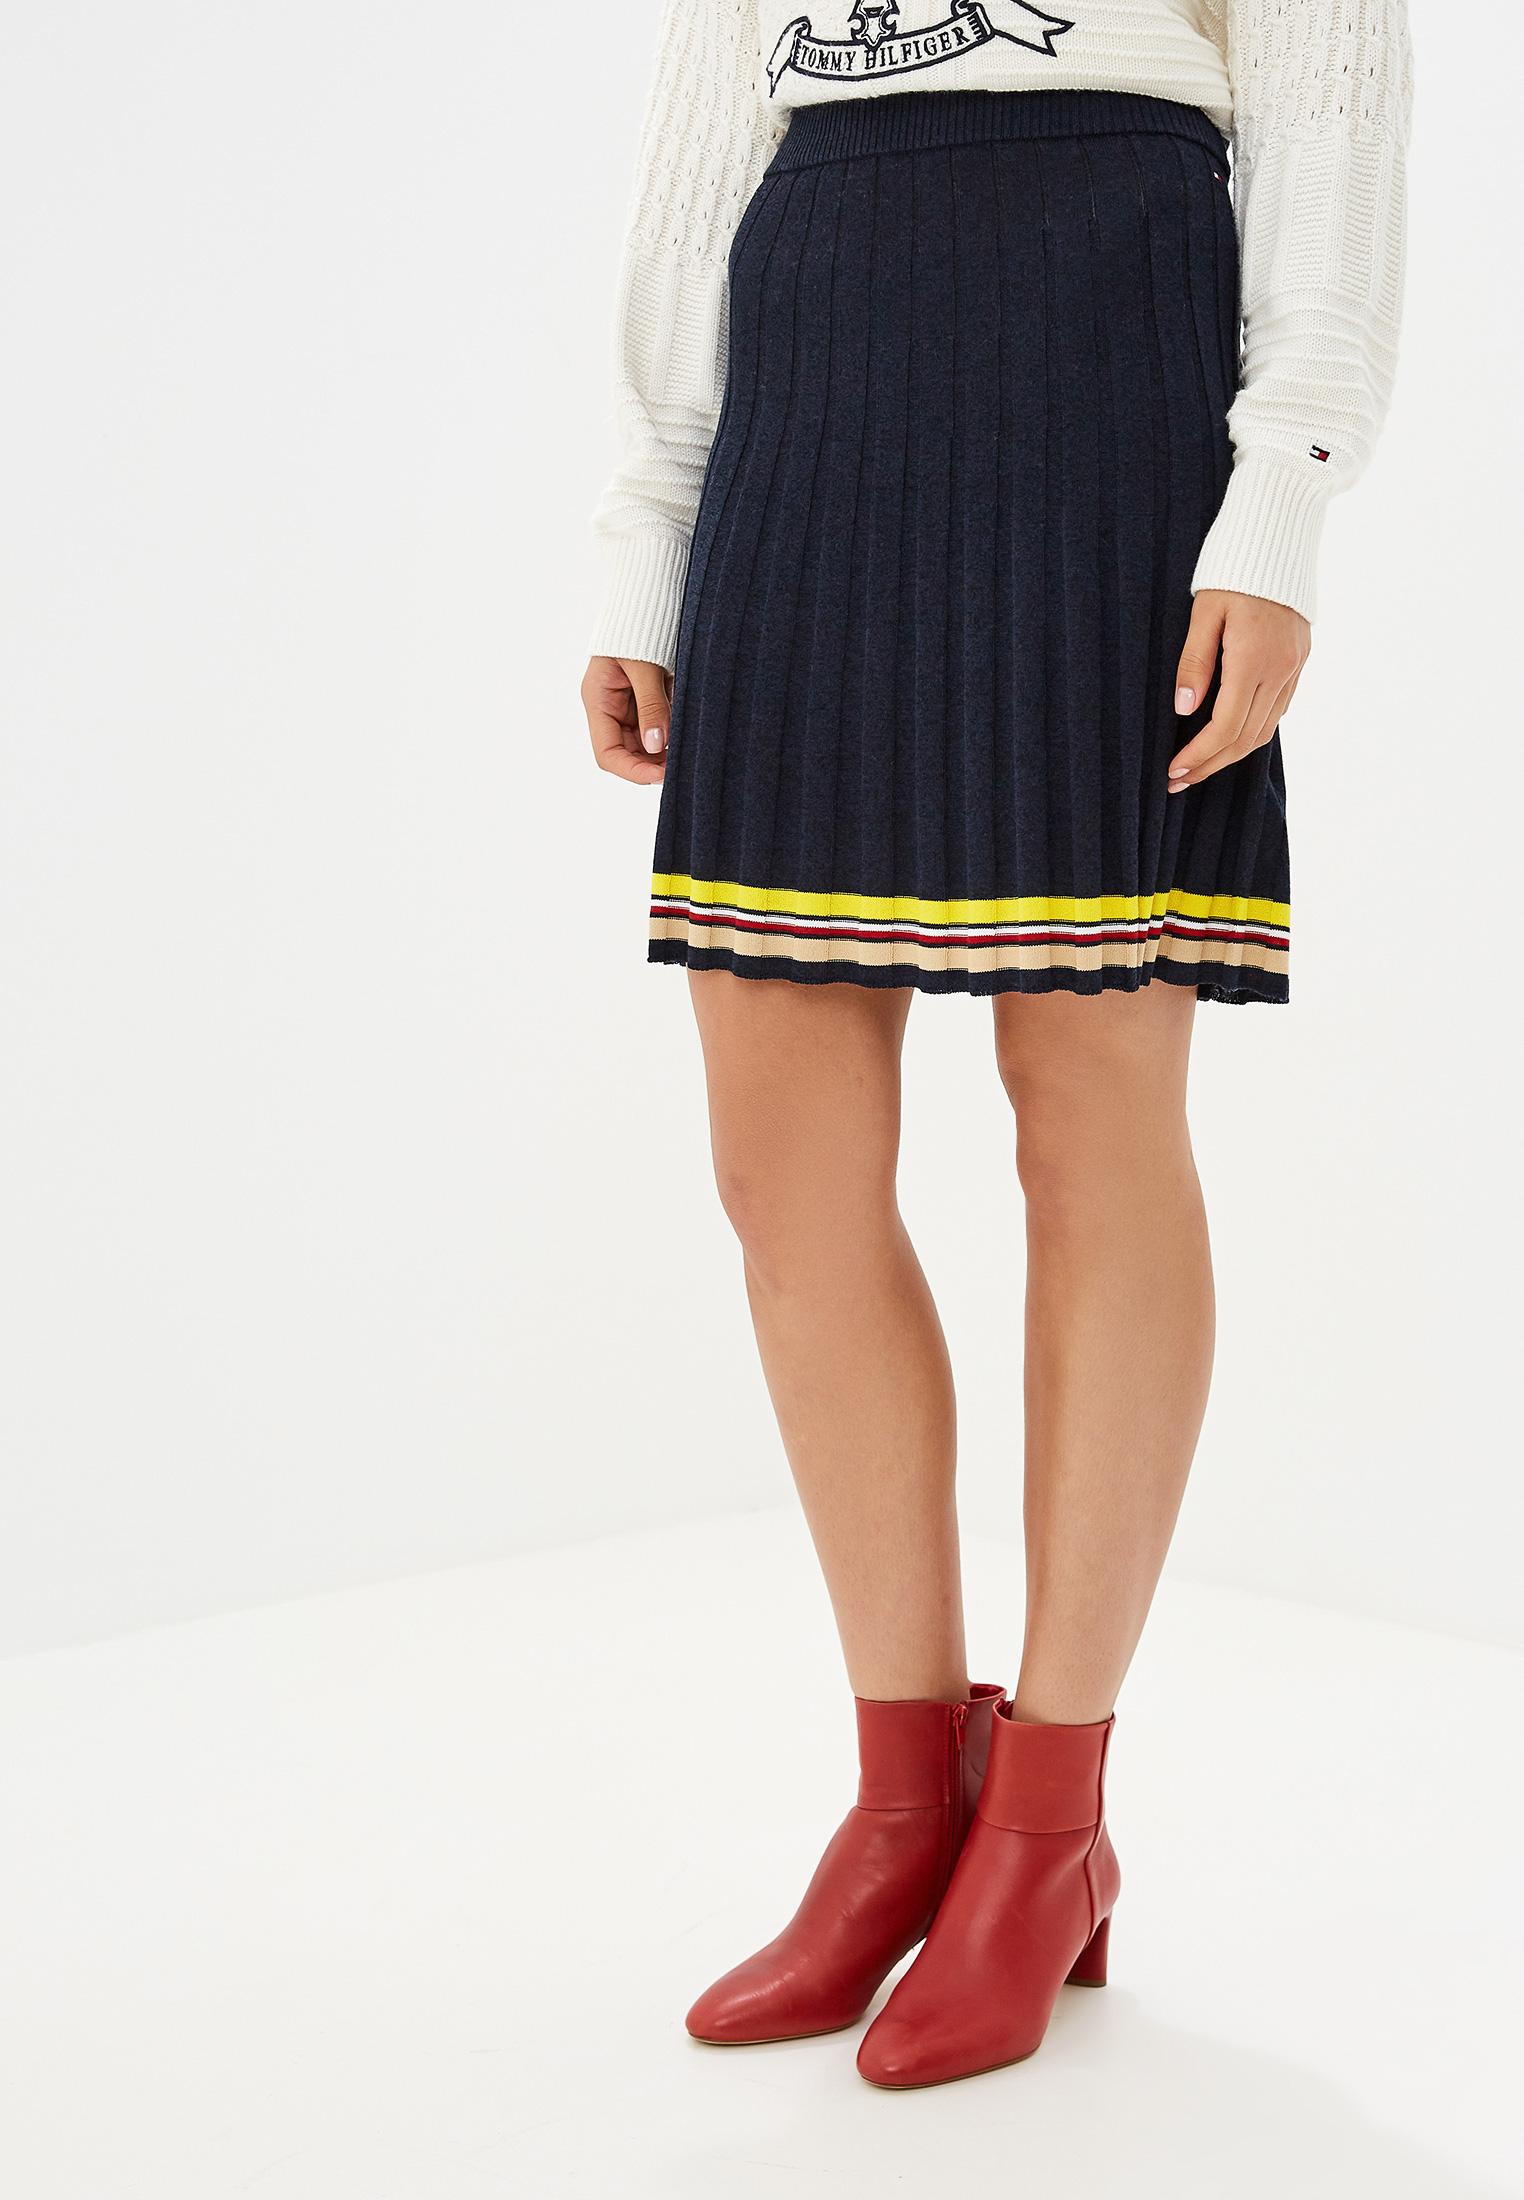 Широкая юбка Tommy Hilfiger (Томми Хилфигер) WW0WW25355